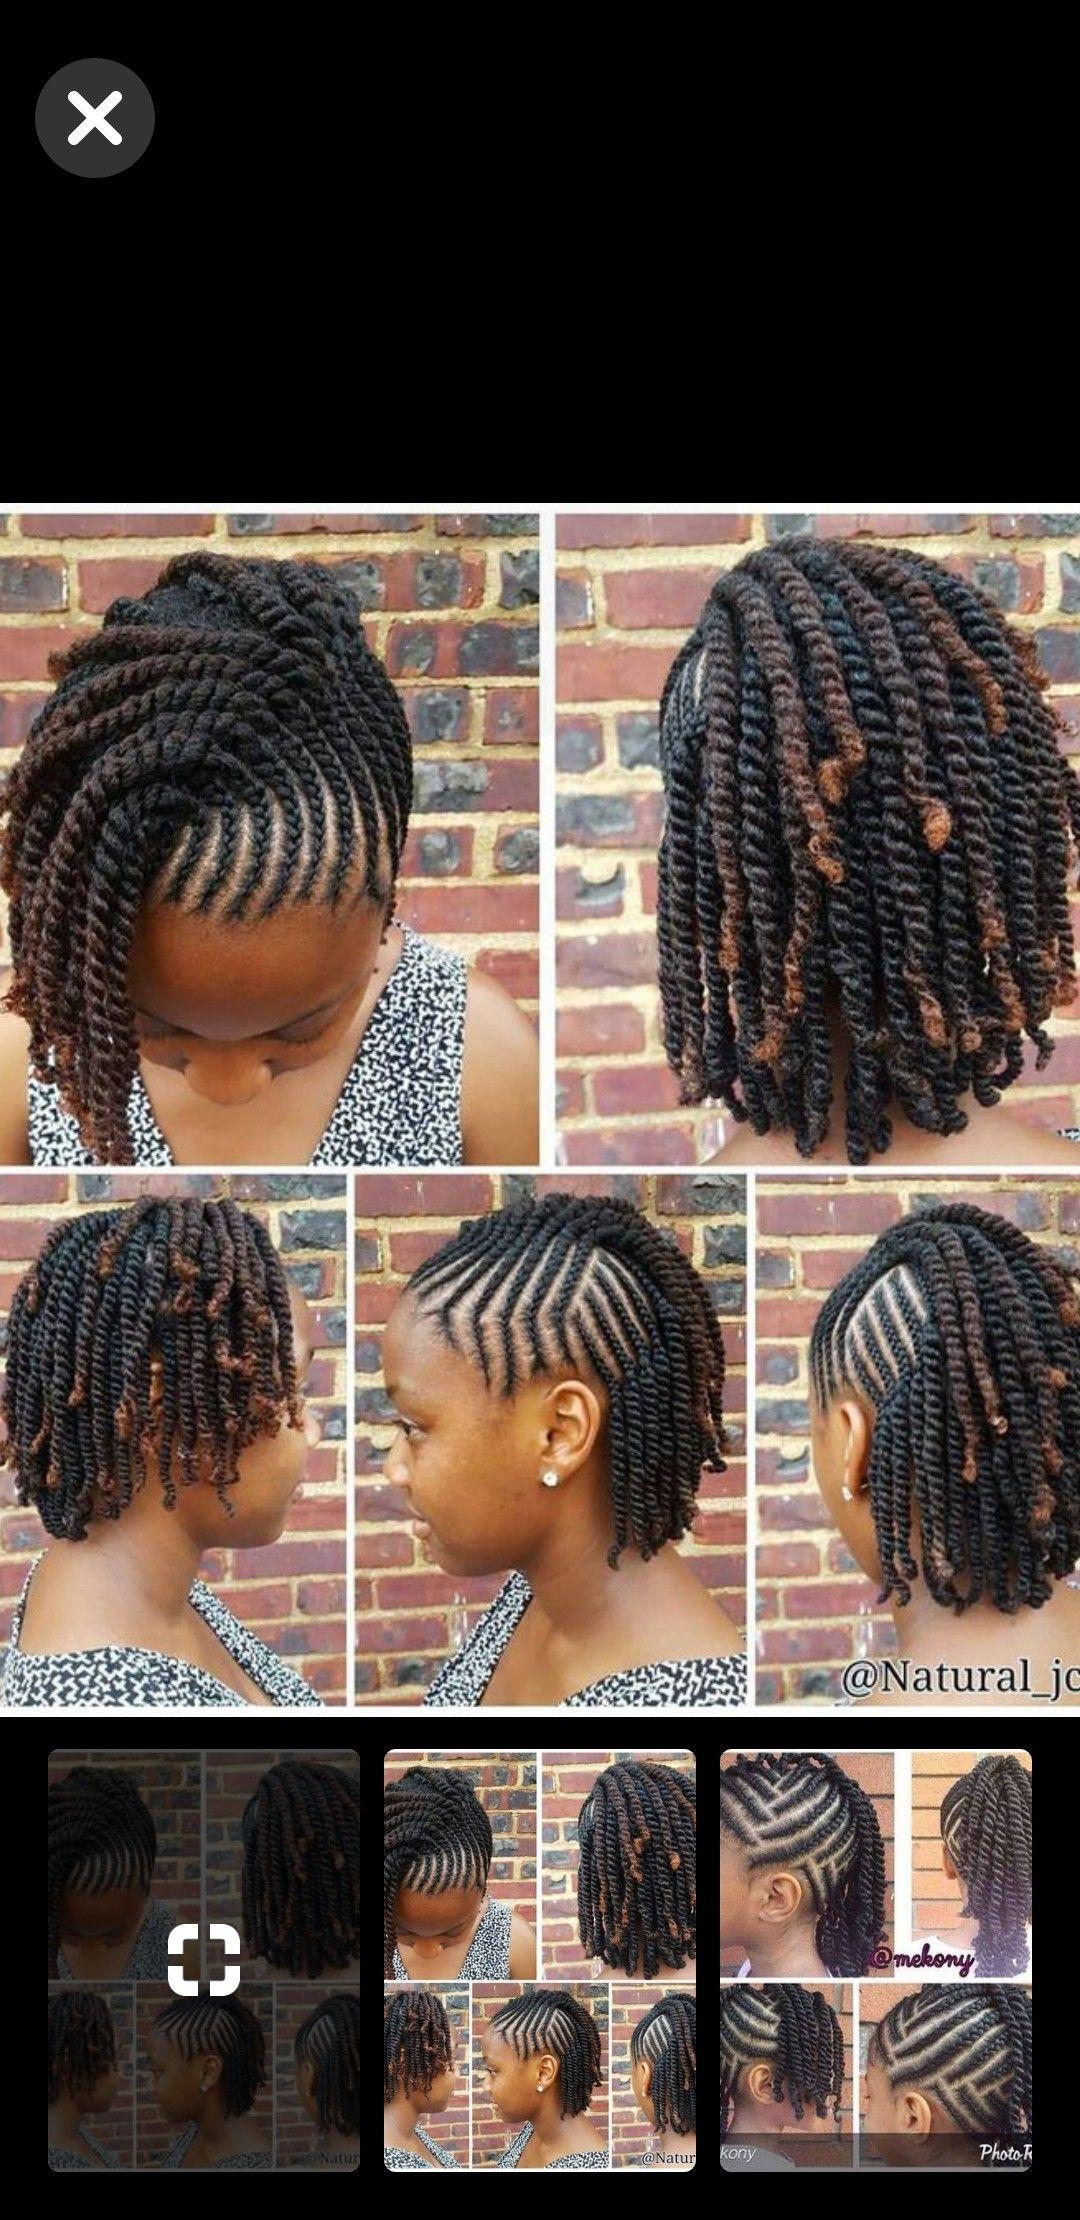 Pin By Zainab Conteh On Kids Natural Hair Braids Braided Hairstyles Girl Hairstyles